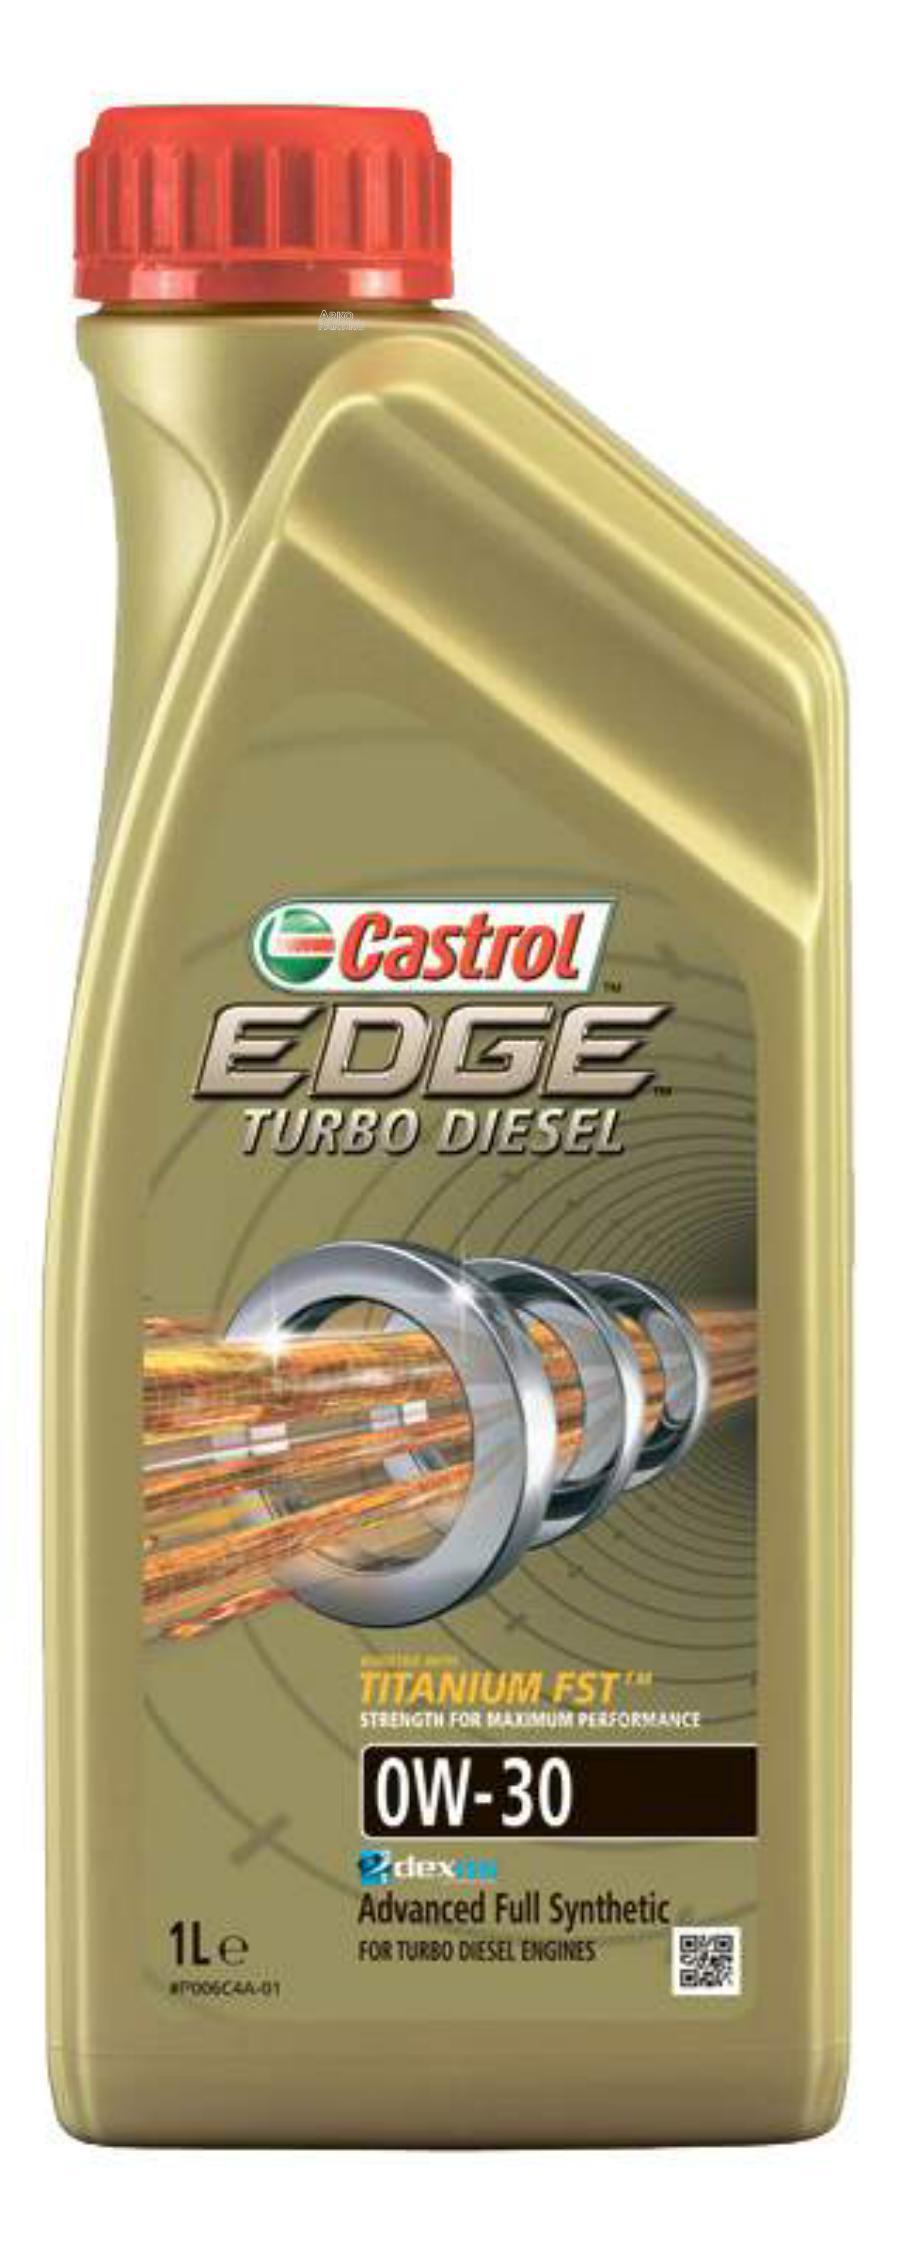 Масло моторное синтетическое EDGE Turbo Diesel Titanium FST 0W-30, 1л